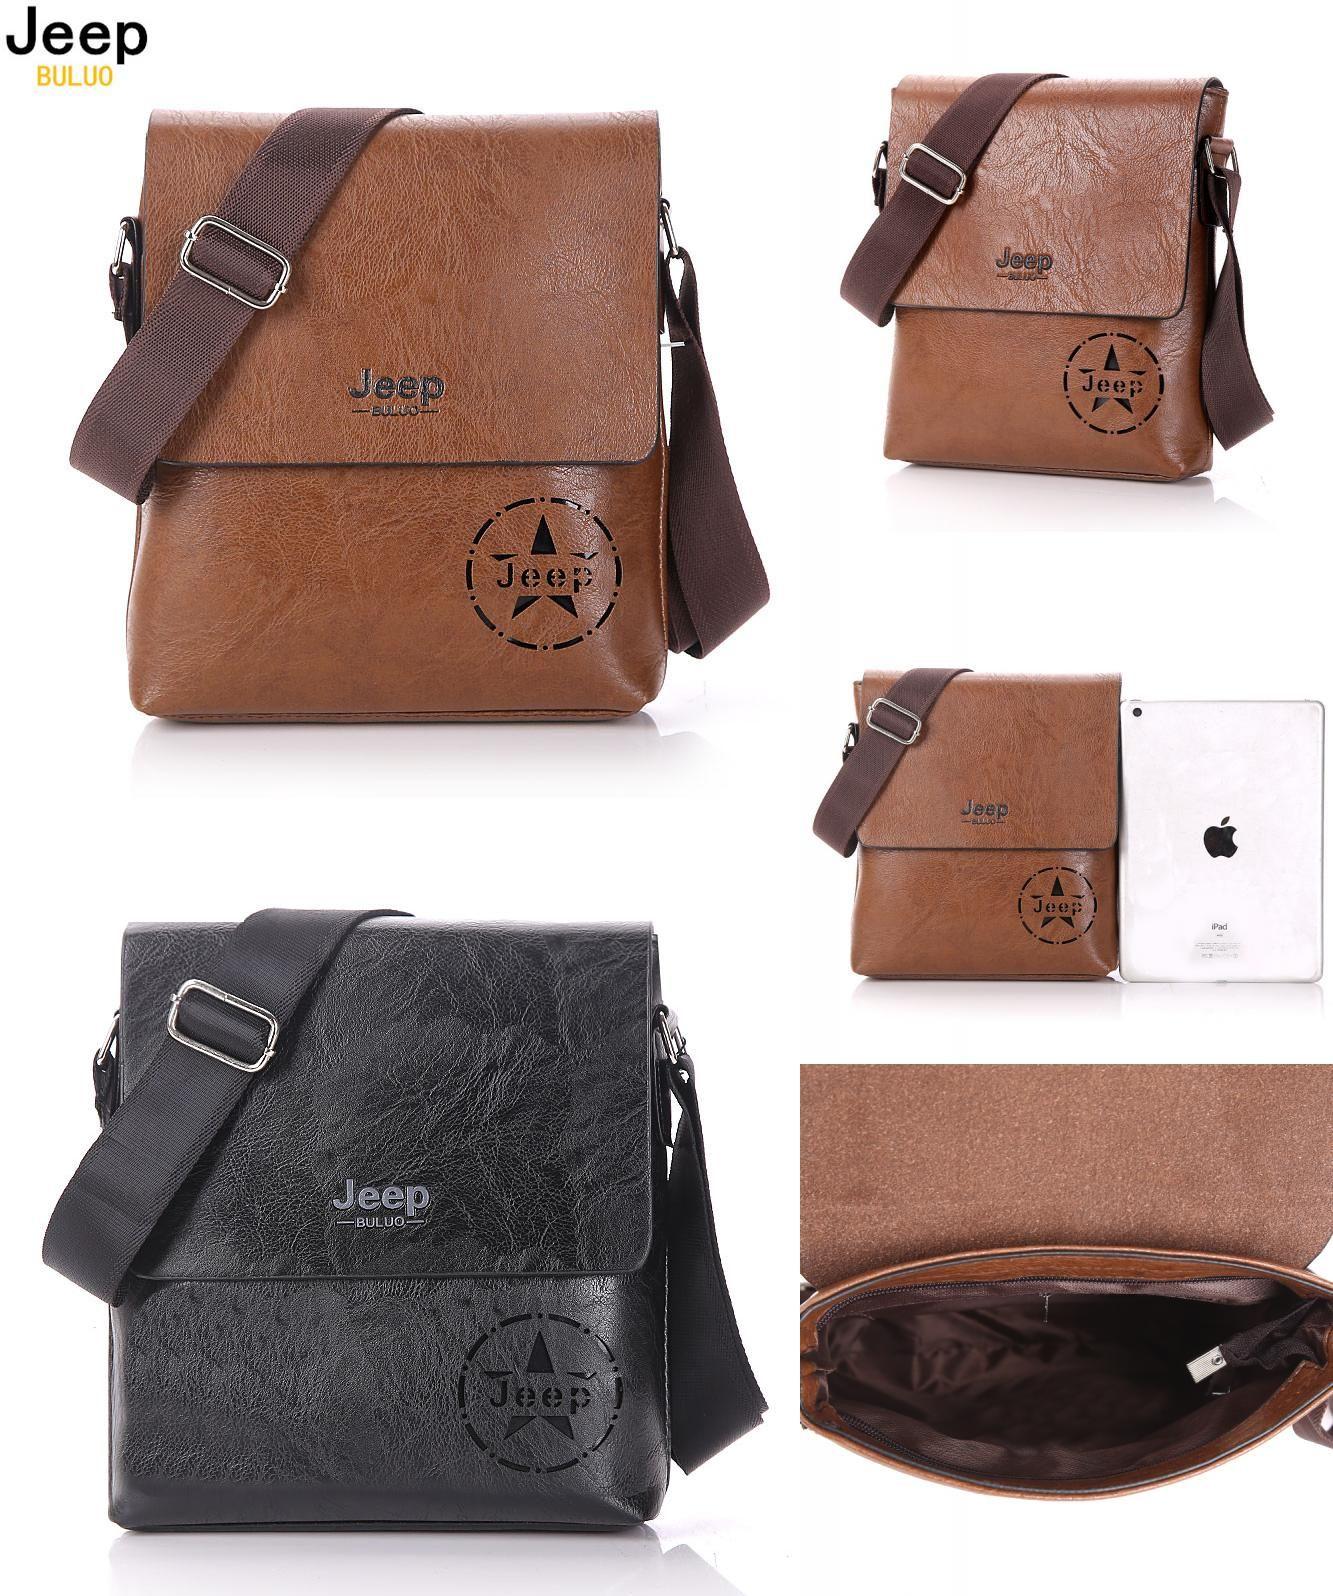 Visit to Buy  JEEP BULUO Famous Brand Men Bag Casual Business Leather Mens  Messenger afca9371e29e6